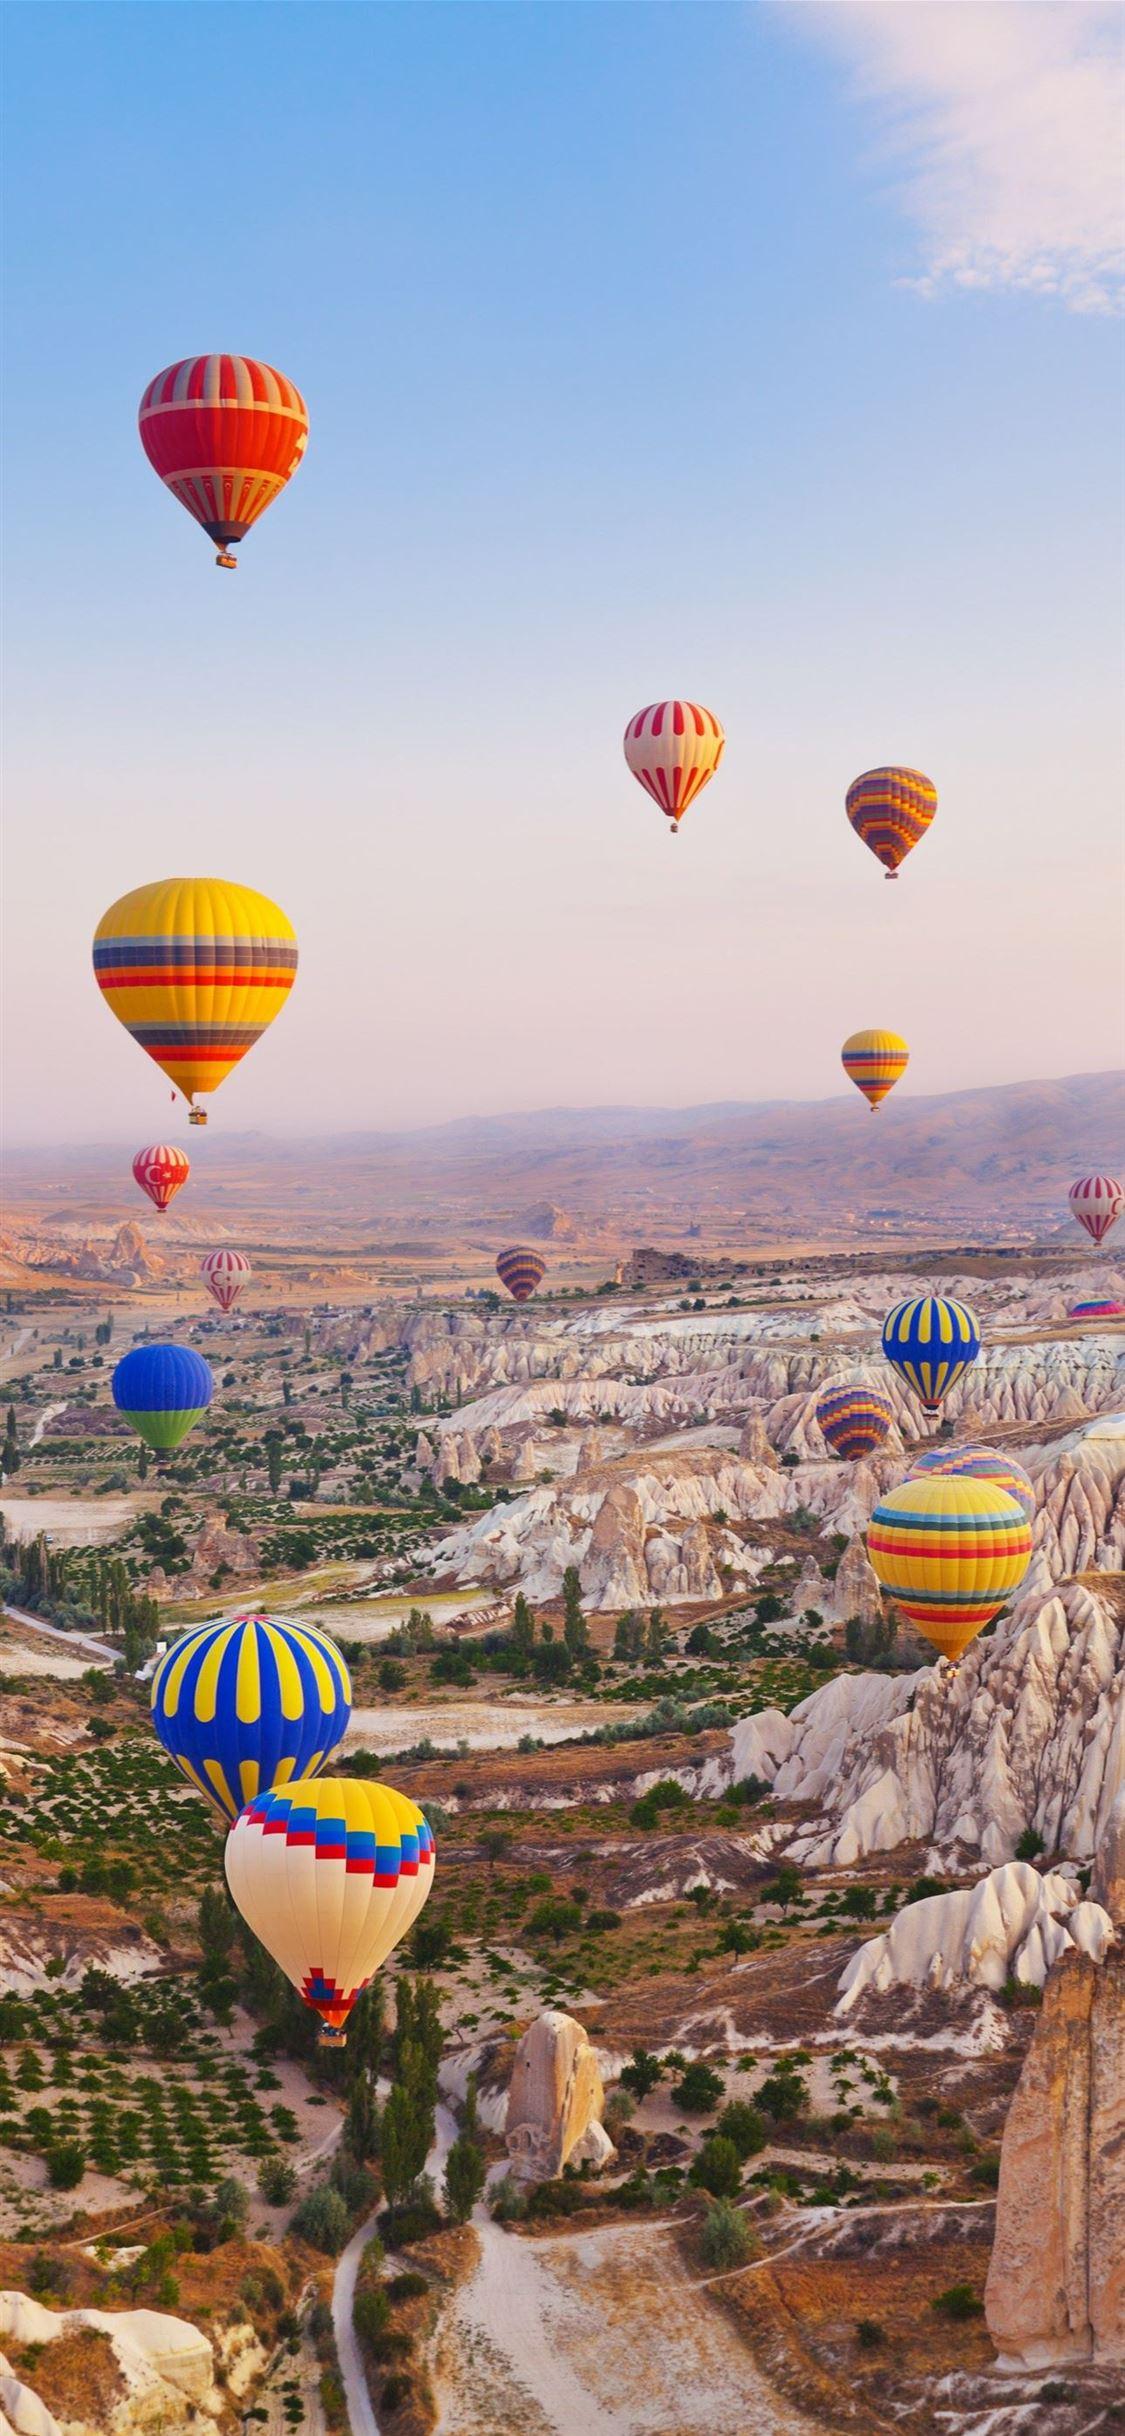 Cappadocia Hot Air Balloon Ride Bucket List Balloo Iphone X Wallpapers Free Download